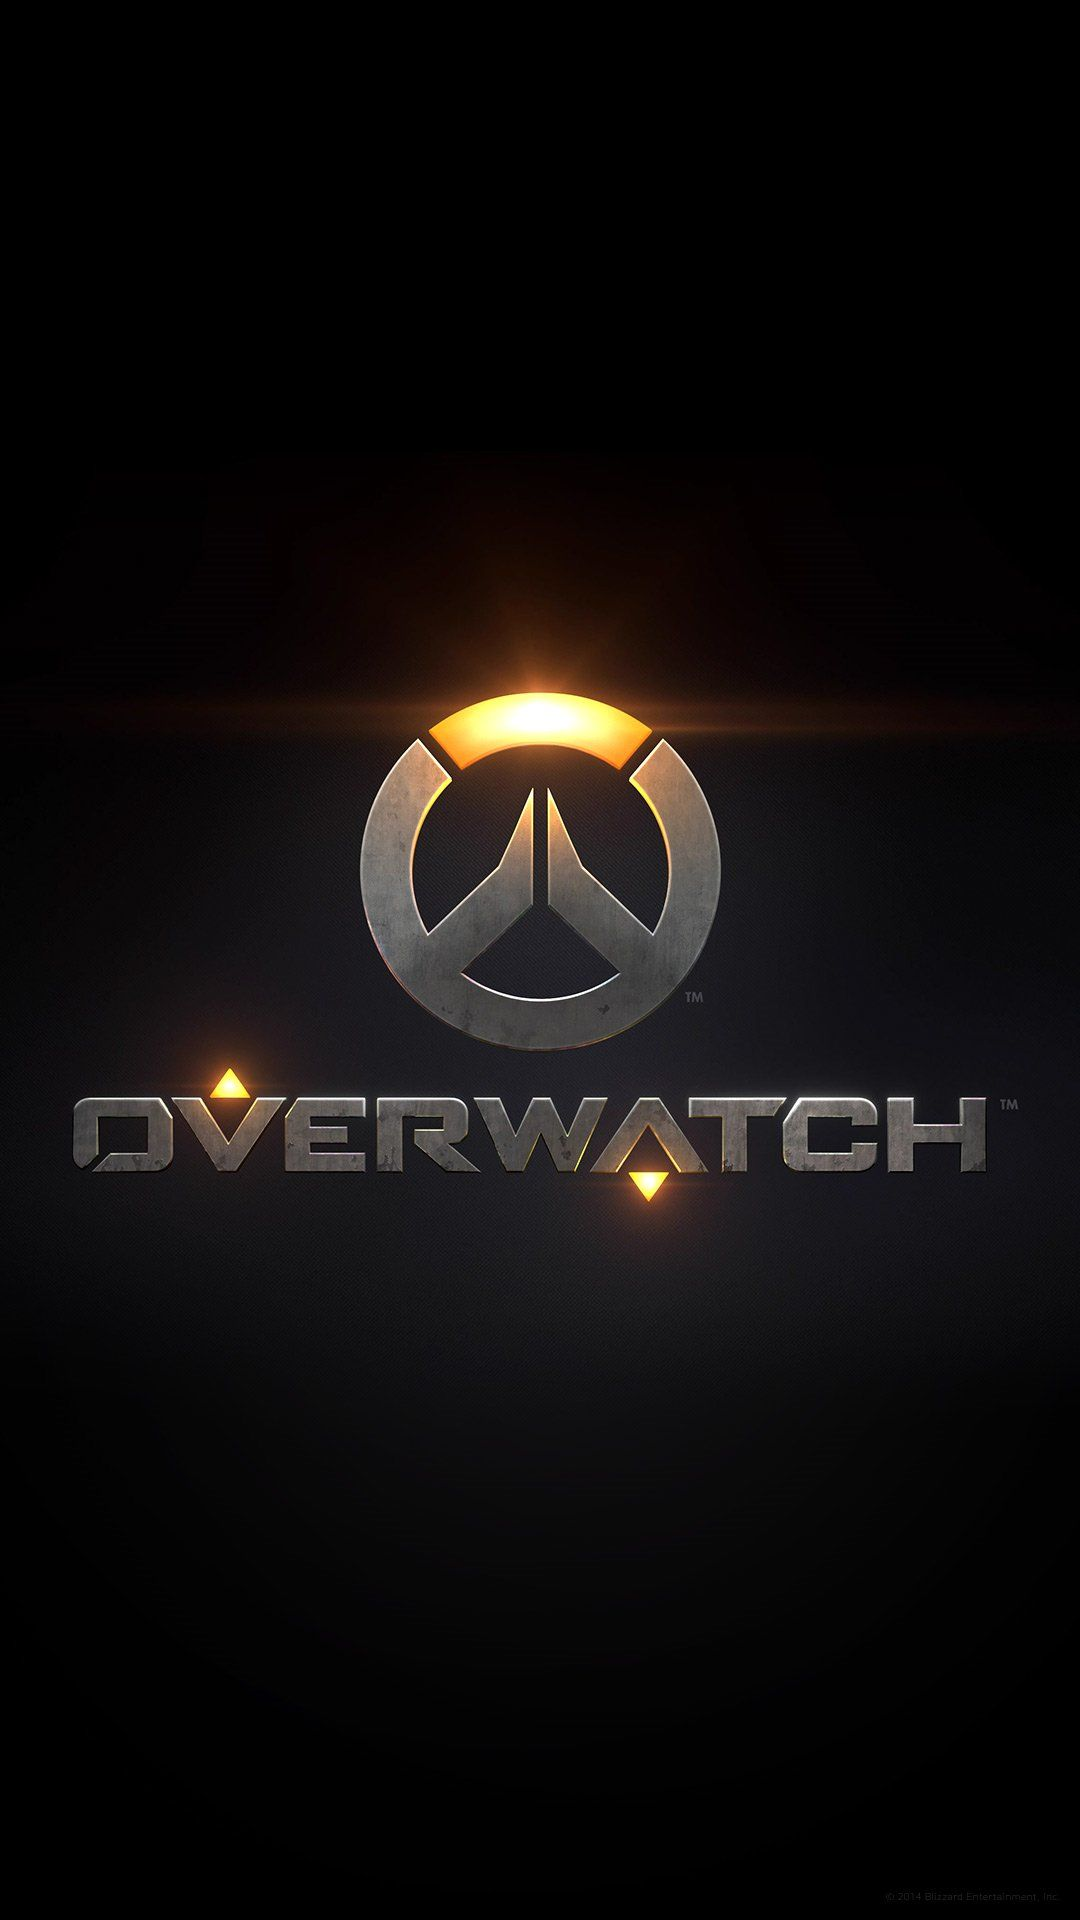 overwatch phone wallpaper Google Search Overwatch